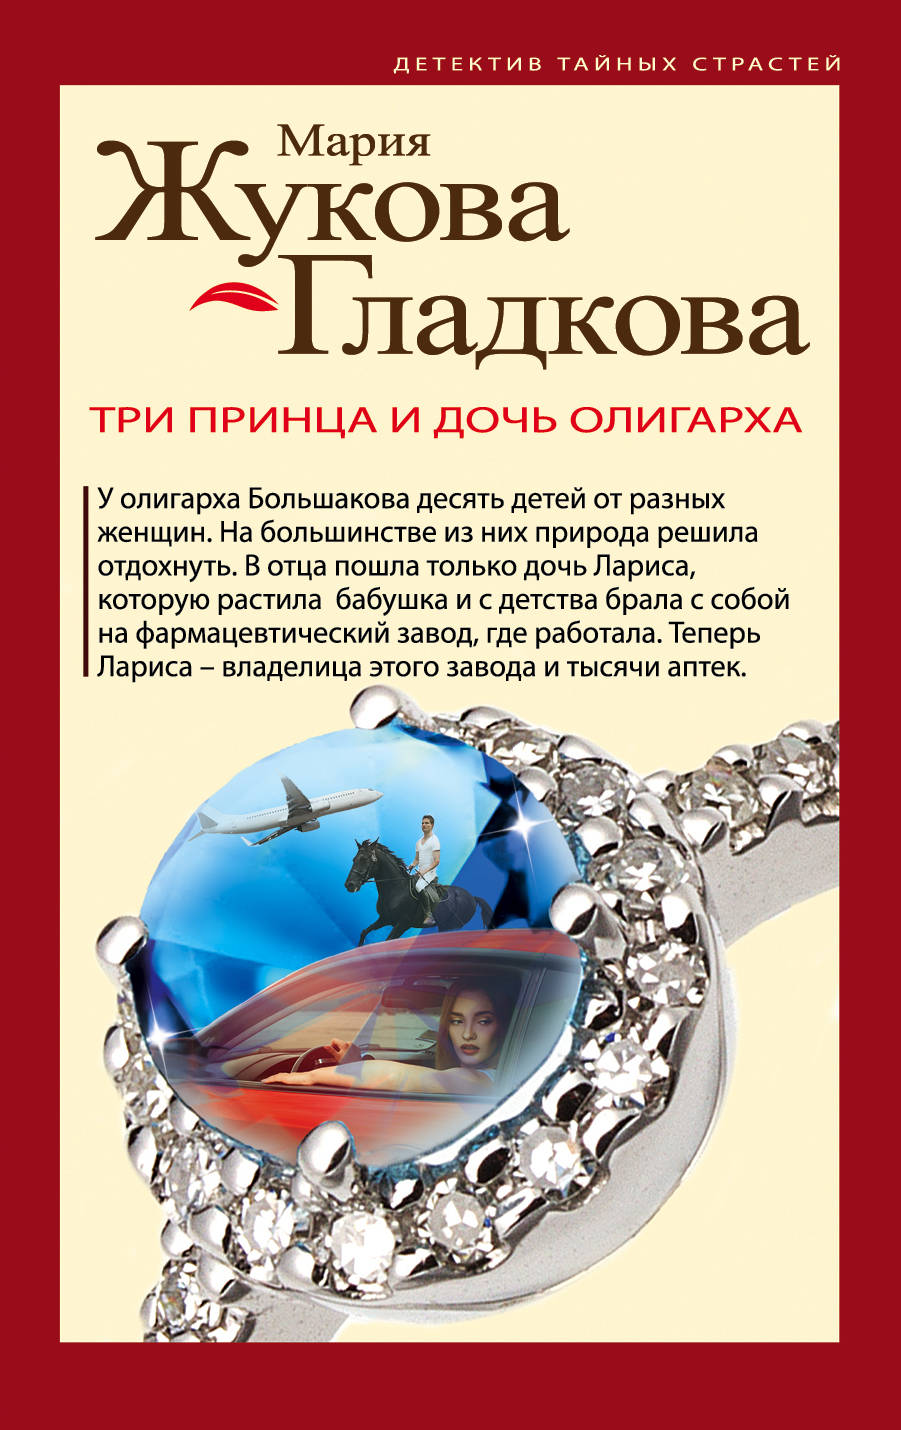 Жукова-Гладкова Мария Три принца и дочь олигарха